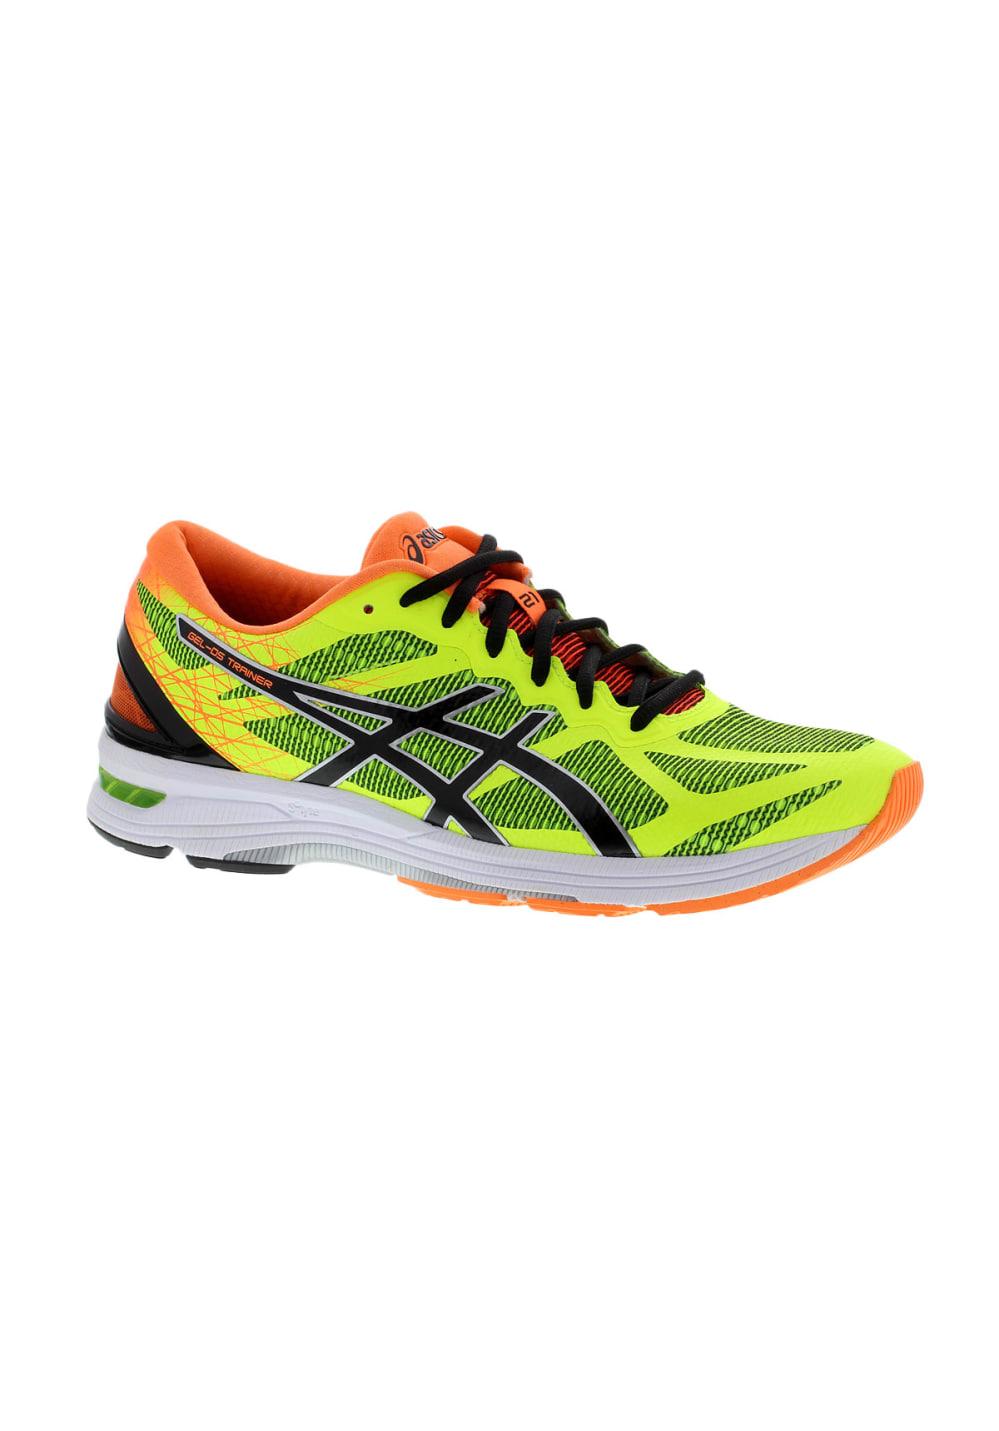 ASICS GEL DS Trainer 21 Chaussures running pour Homme Vert